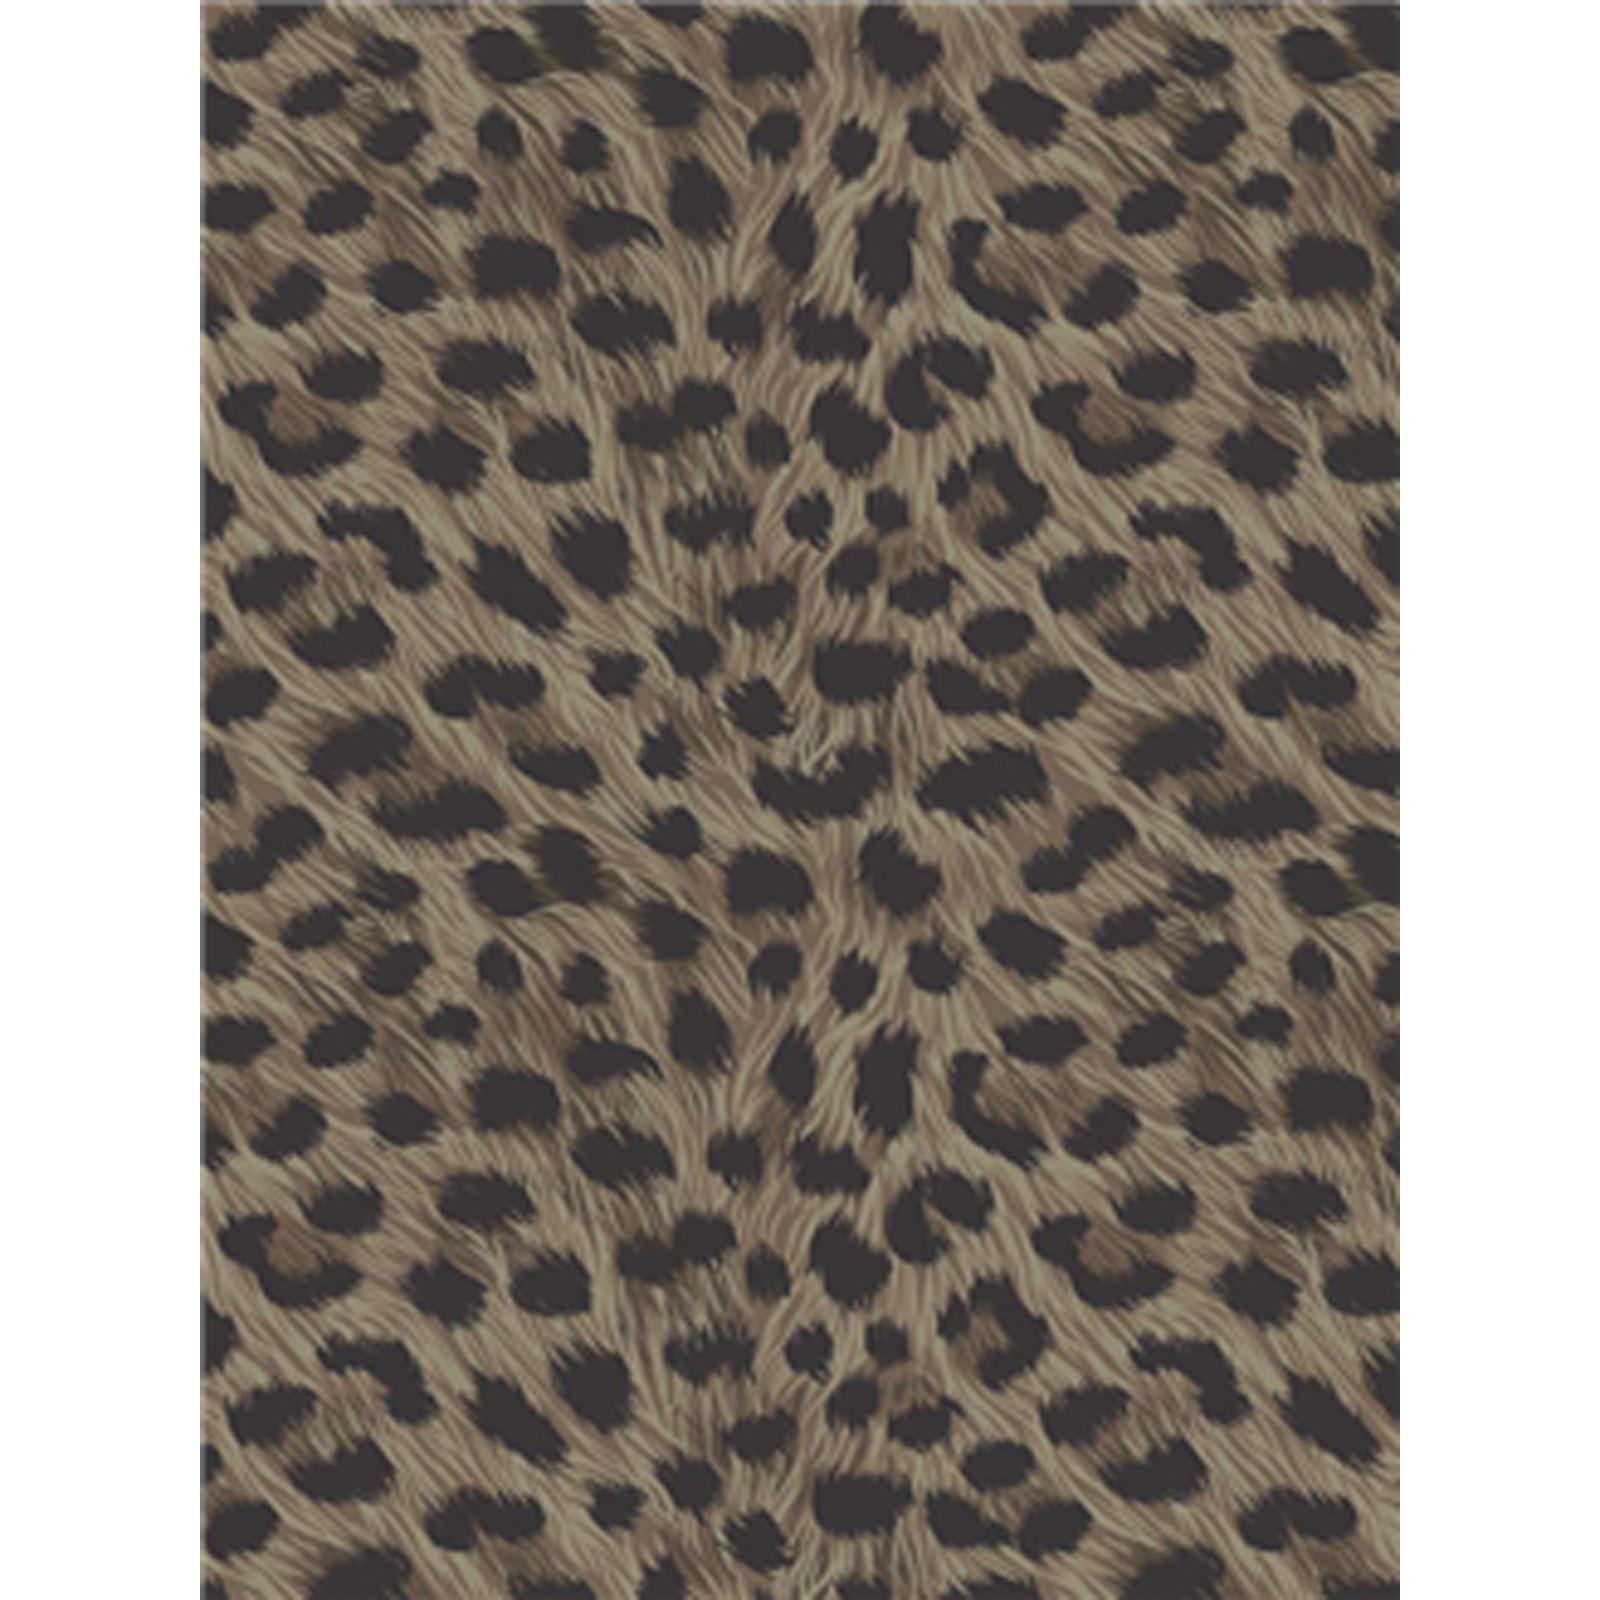 leoparden druck tapete schokobraun zinn wandtapete gesamtes zimmer deko ebay. Black Bedroom Furniture Sets. Home Design Ideas